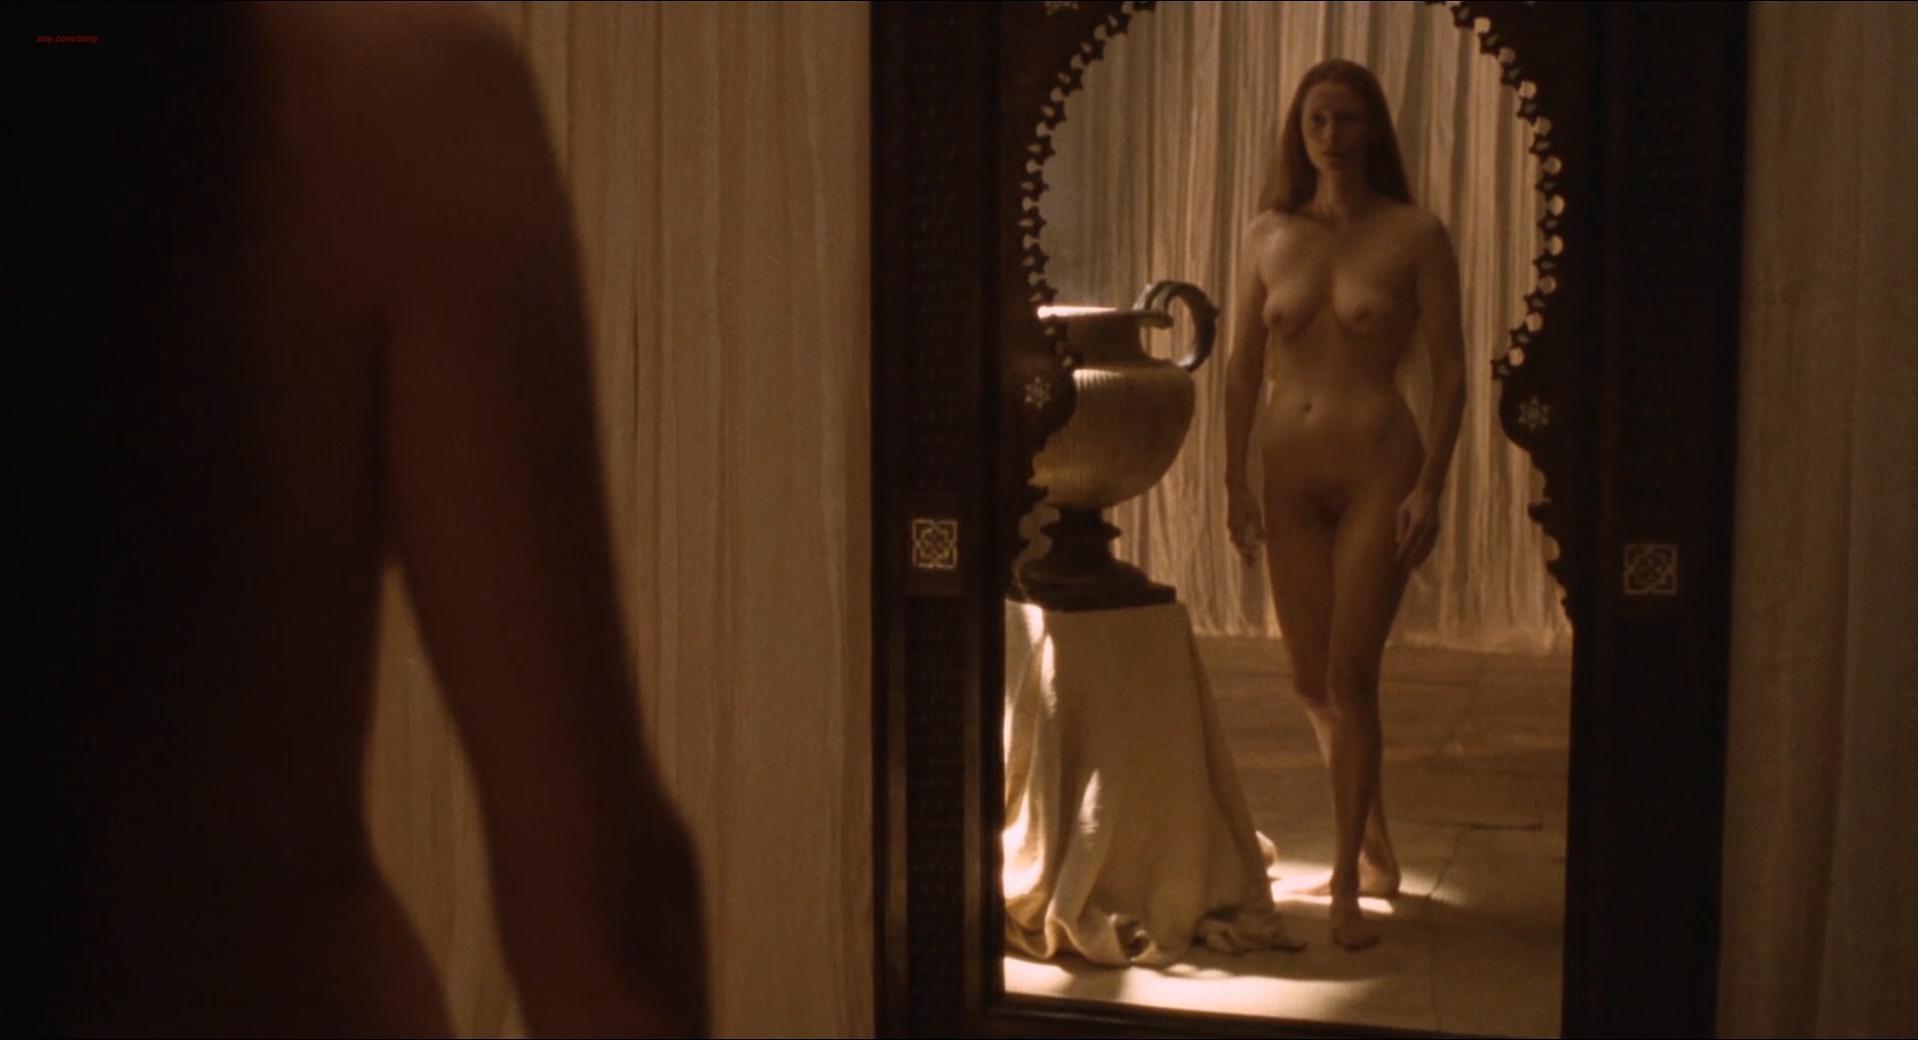 Nasanin nuri nude sex scene on scandalplanetcom - 3 2